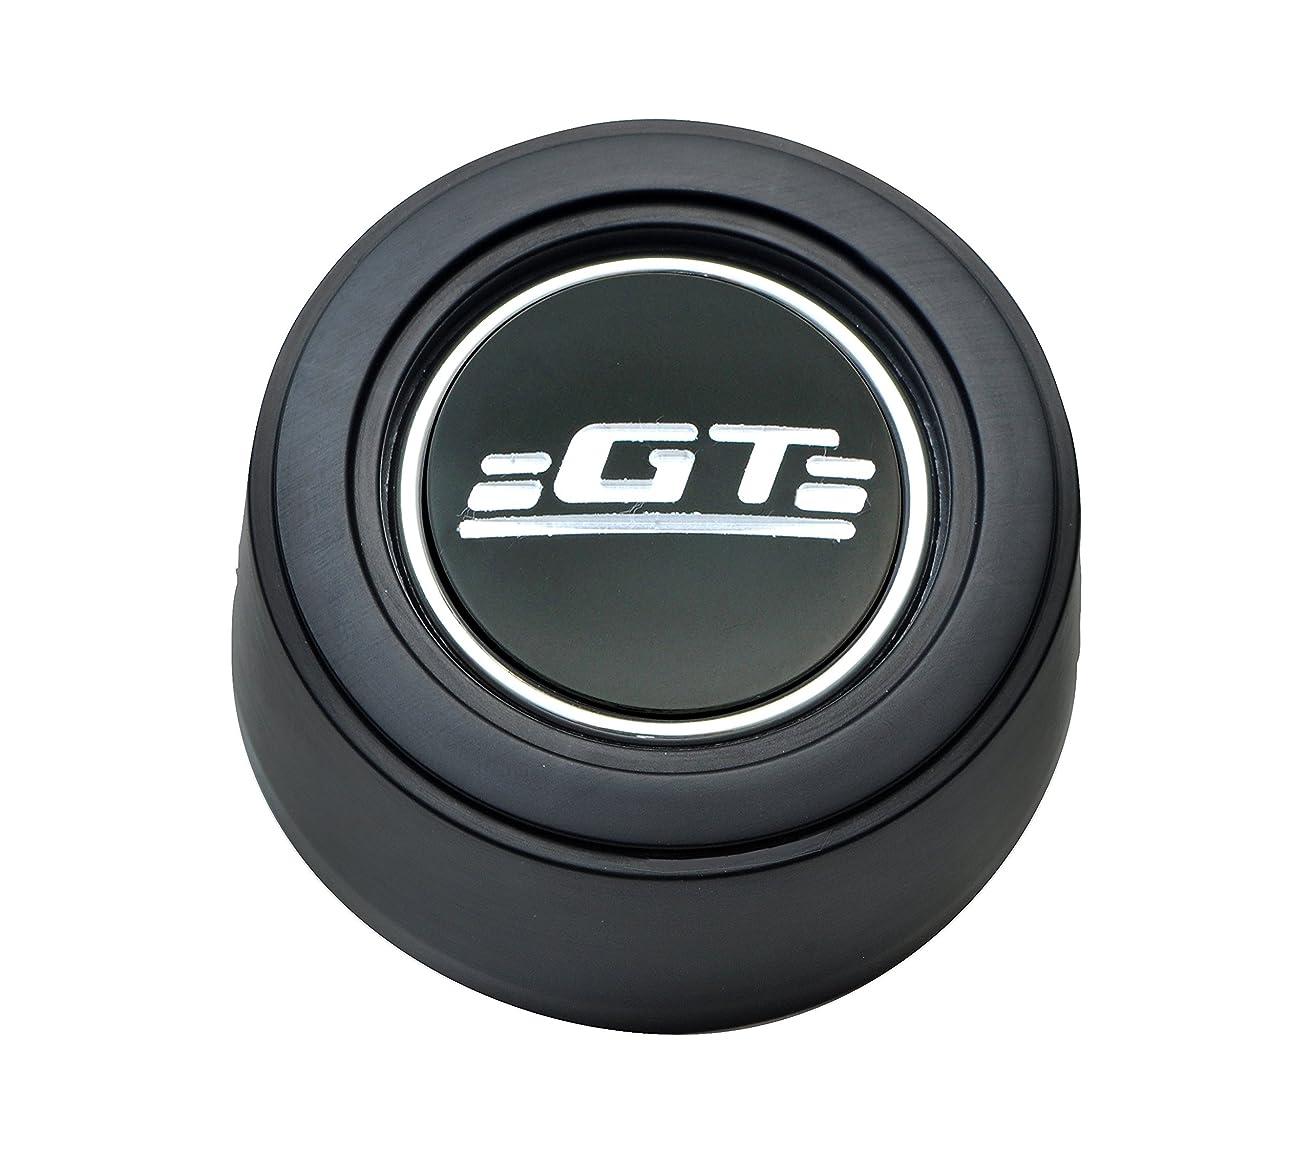 GT Performance 21-1524 Hi-Rise Horn Button with GT Emblem, Black